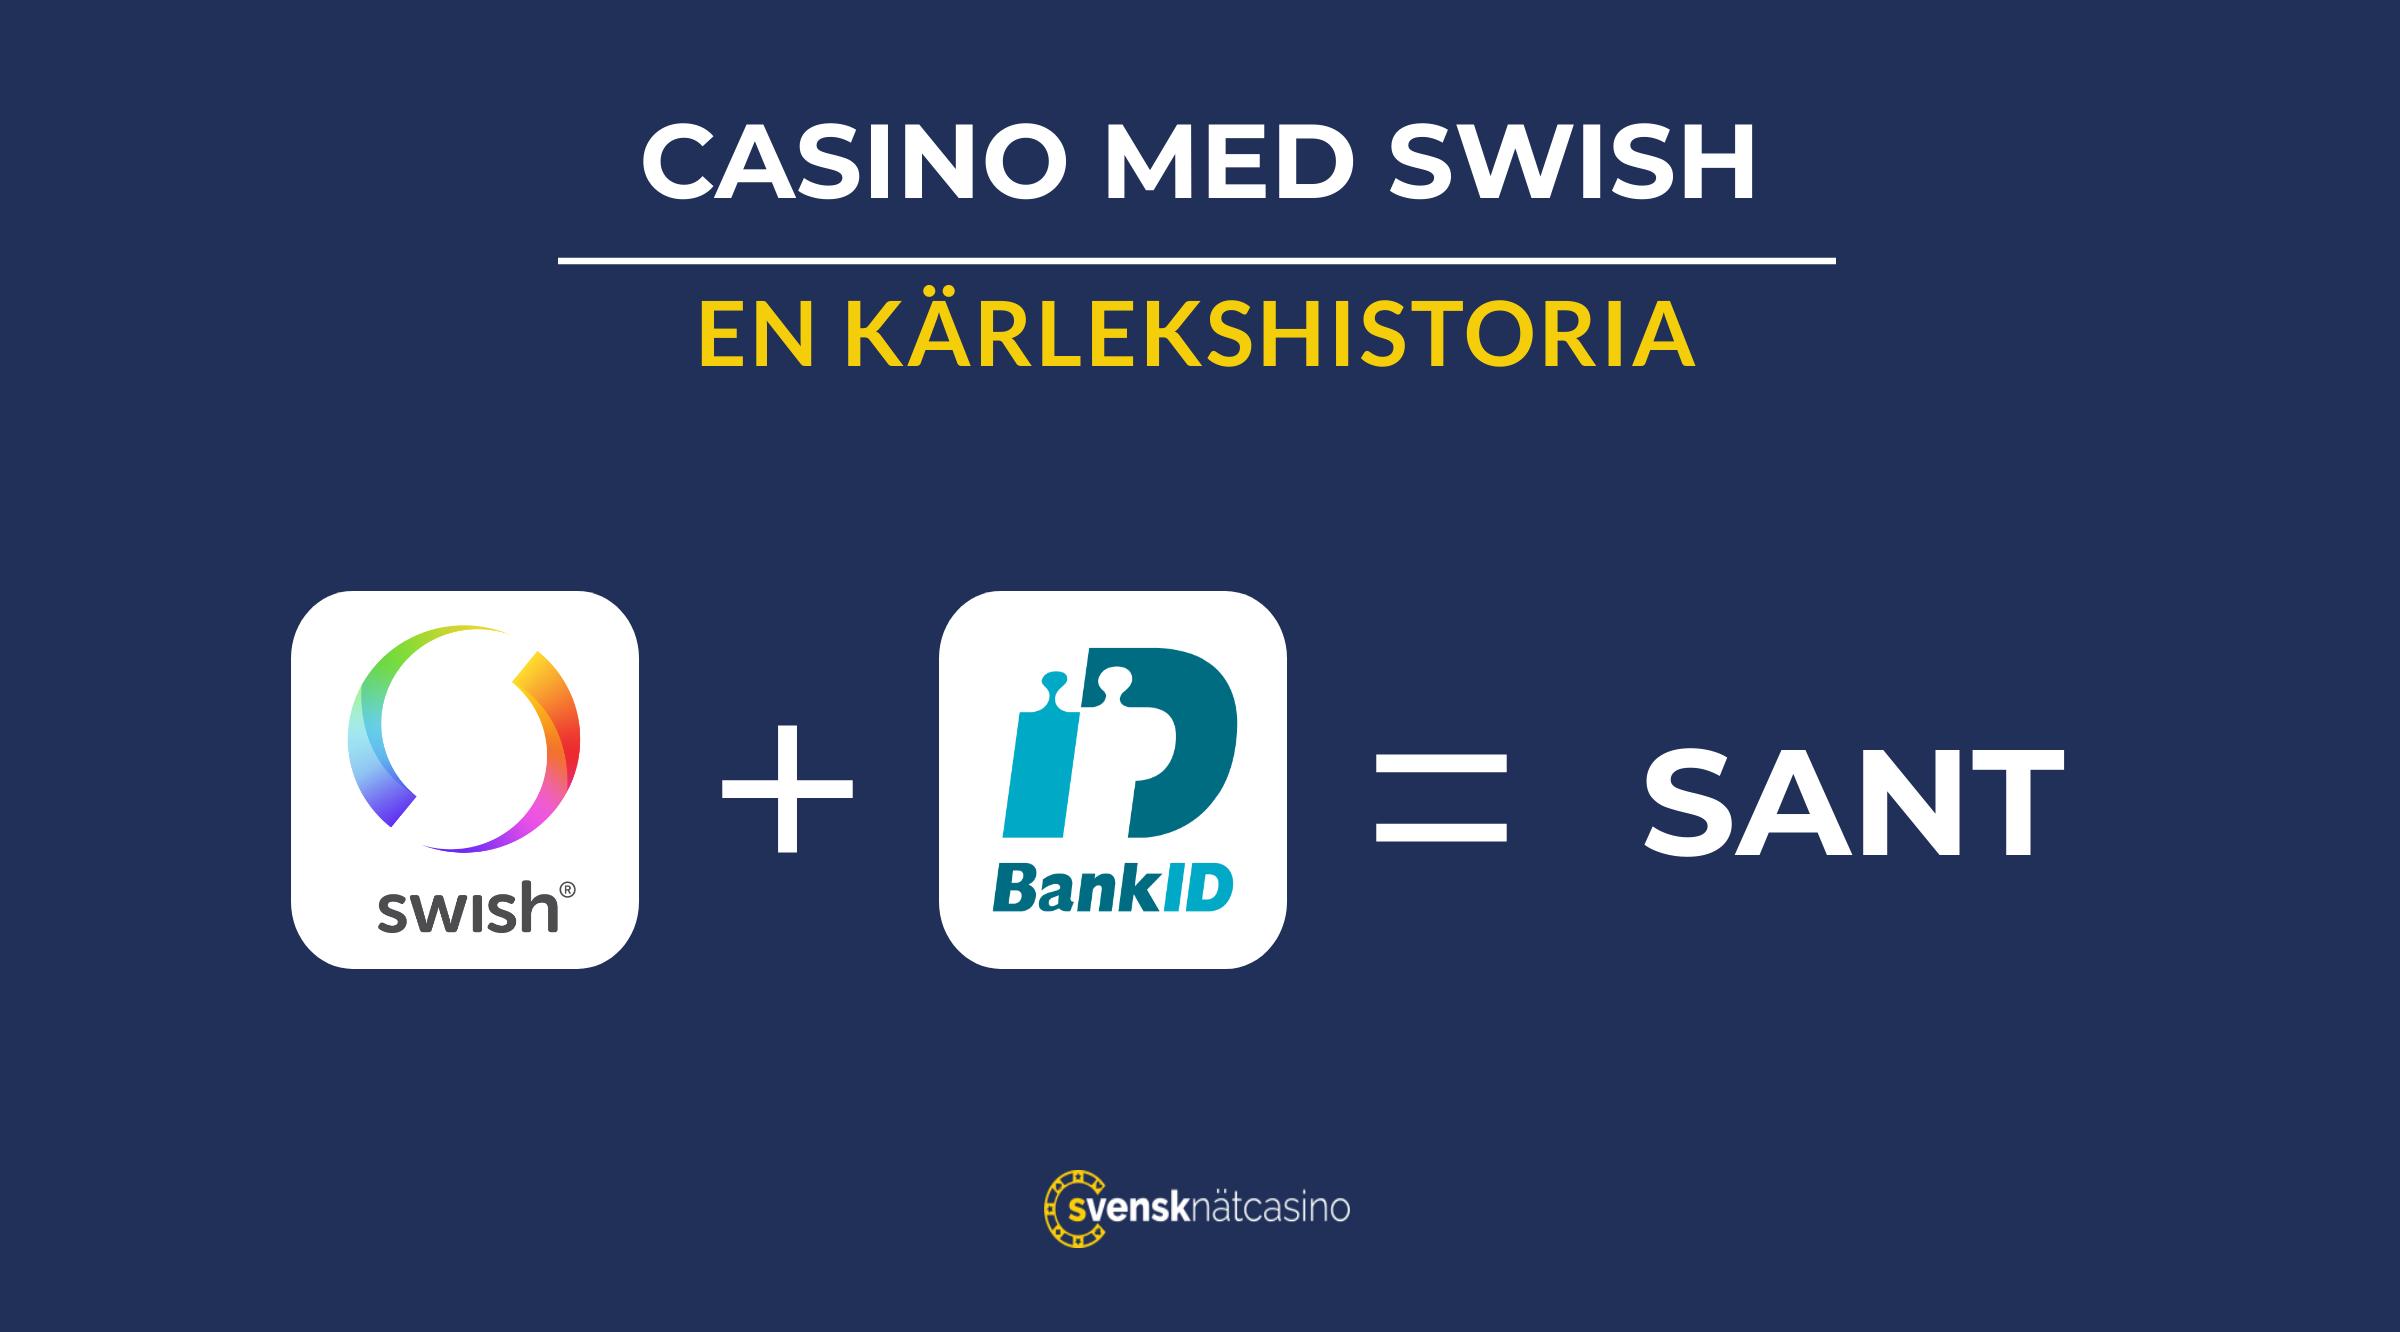 casino med swish bankid svensknatcasino com